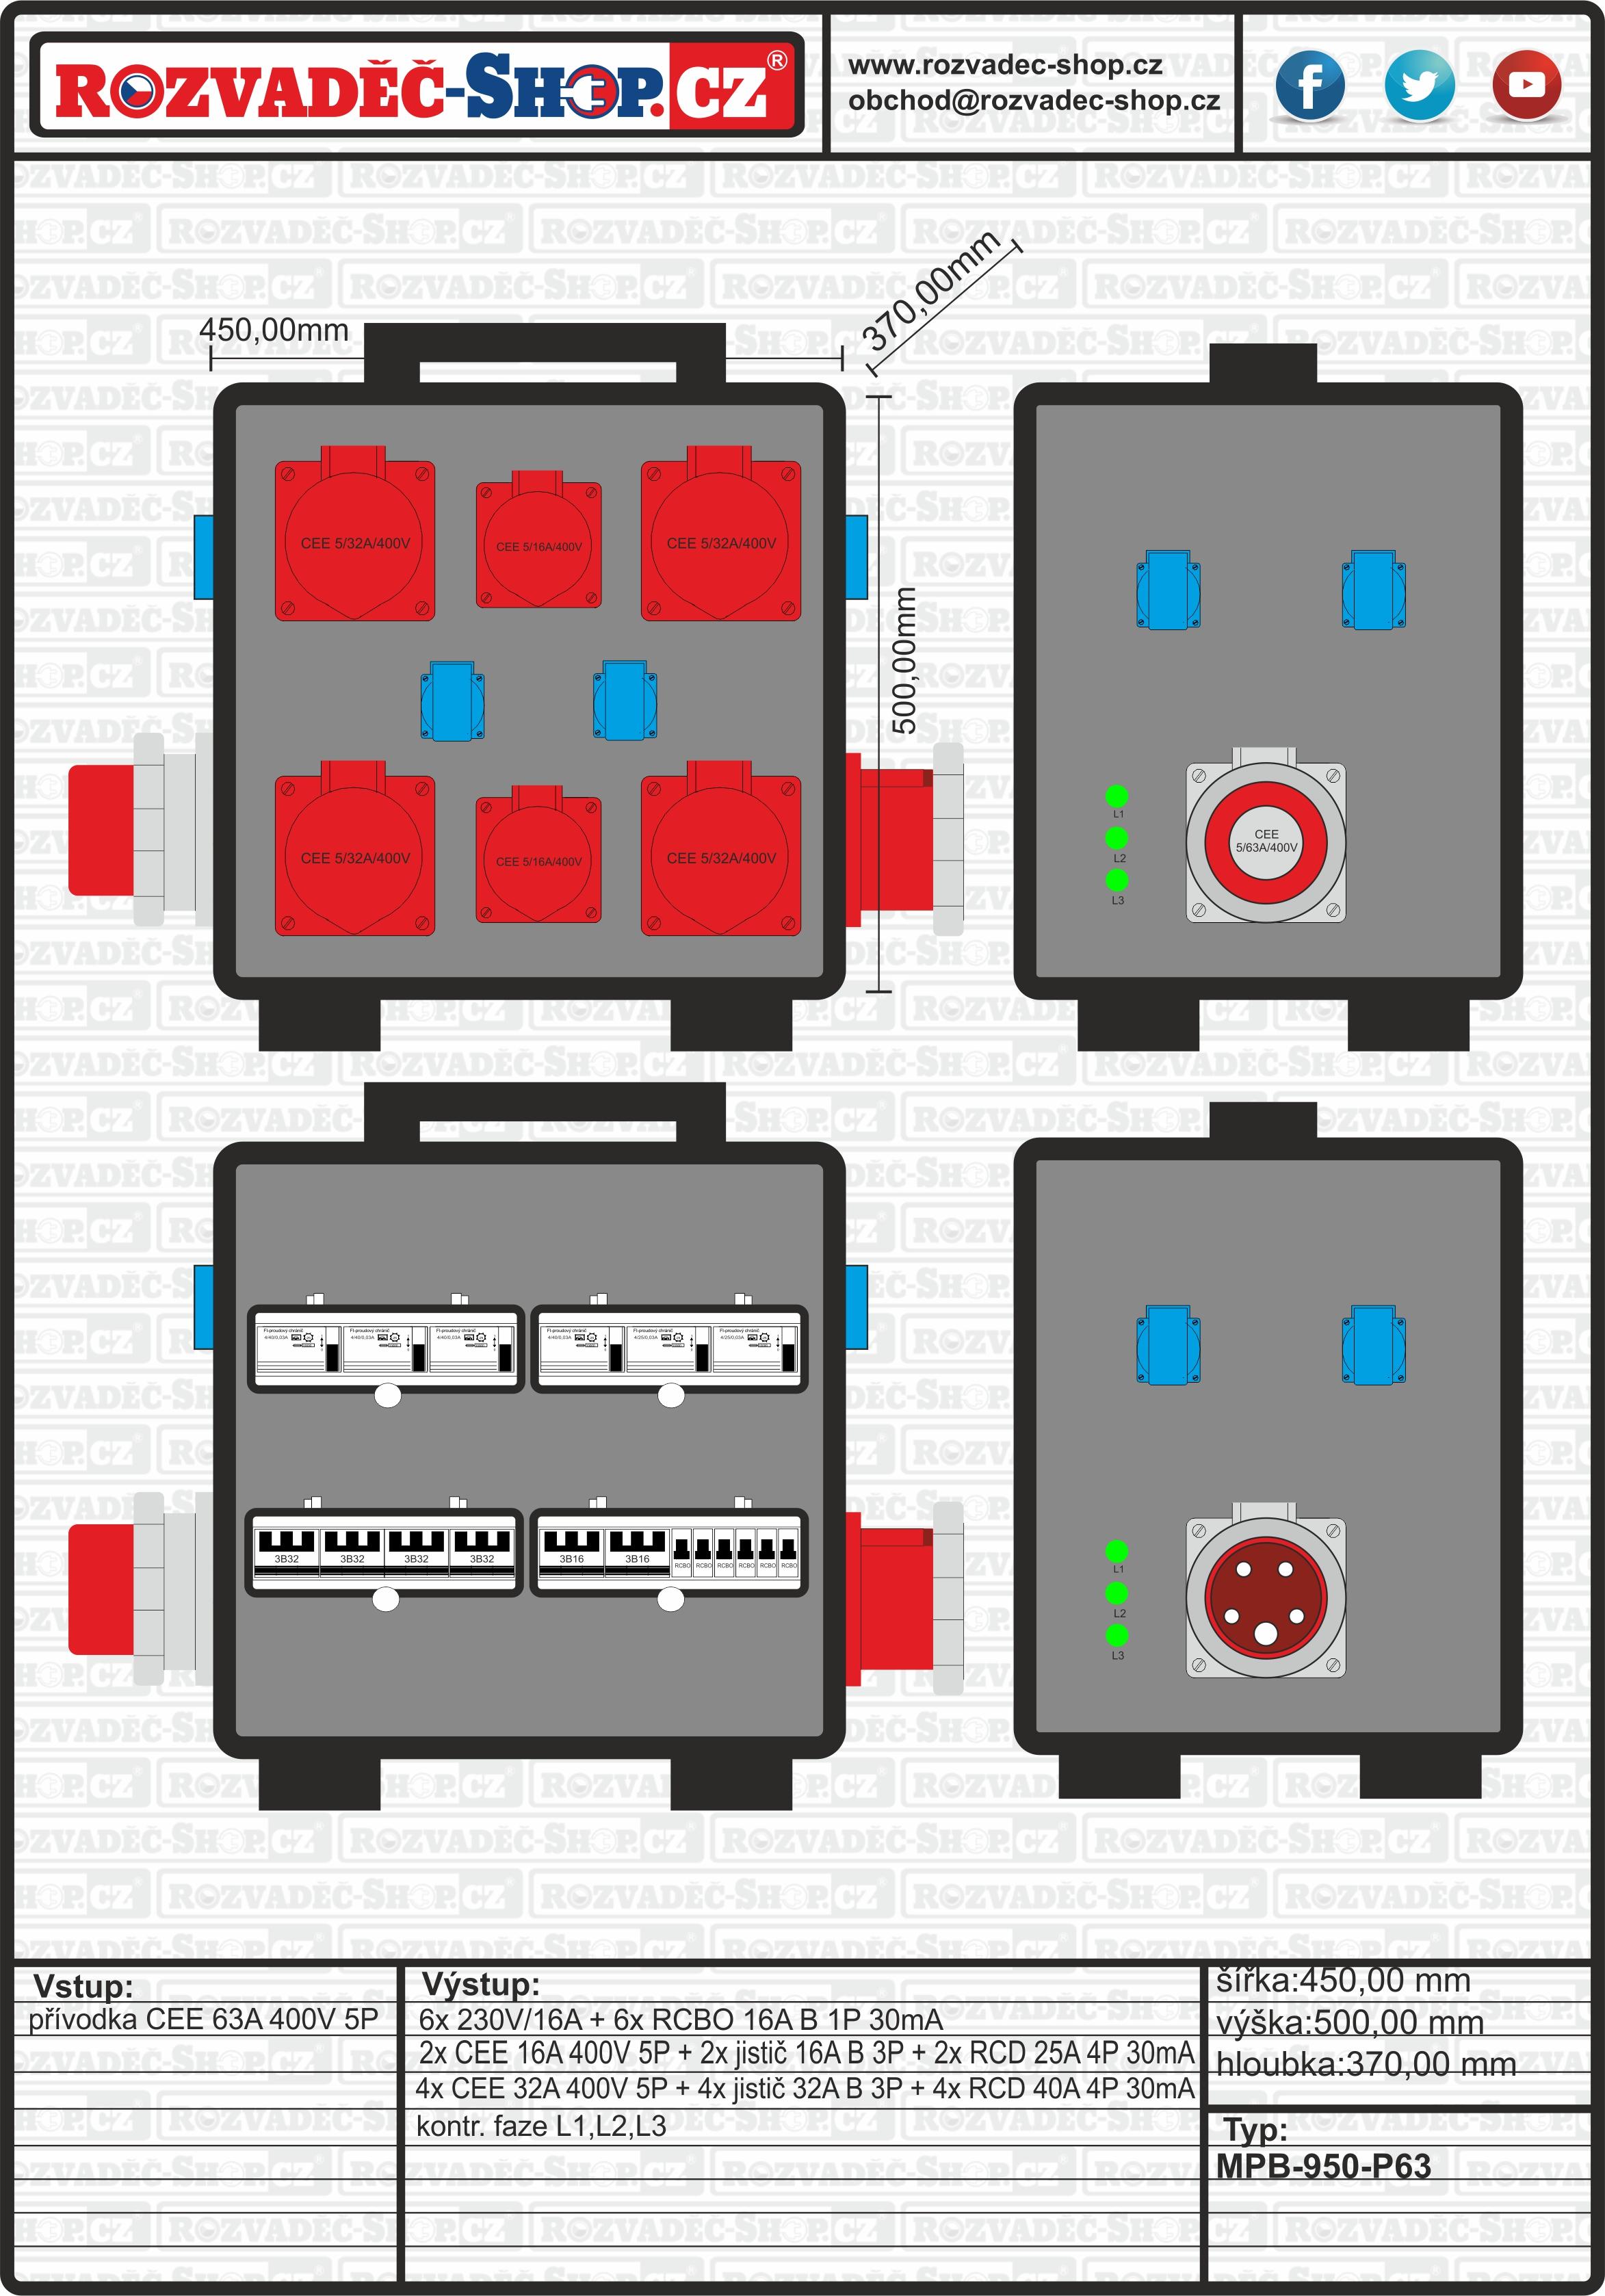 MPB-950-P63-FIN